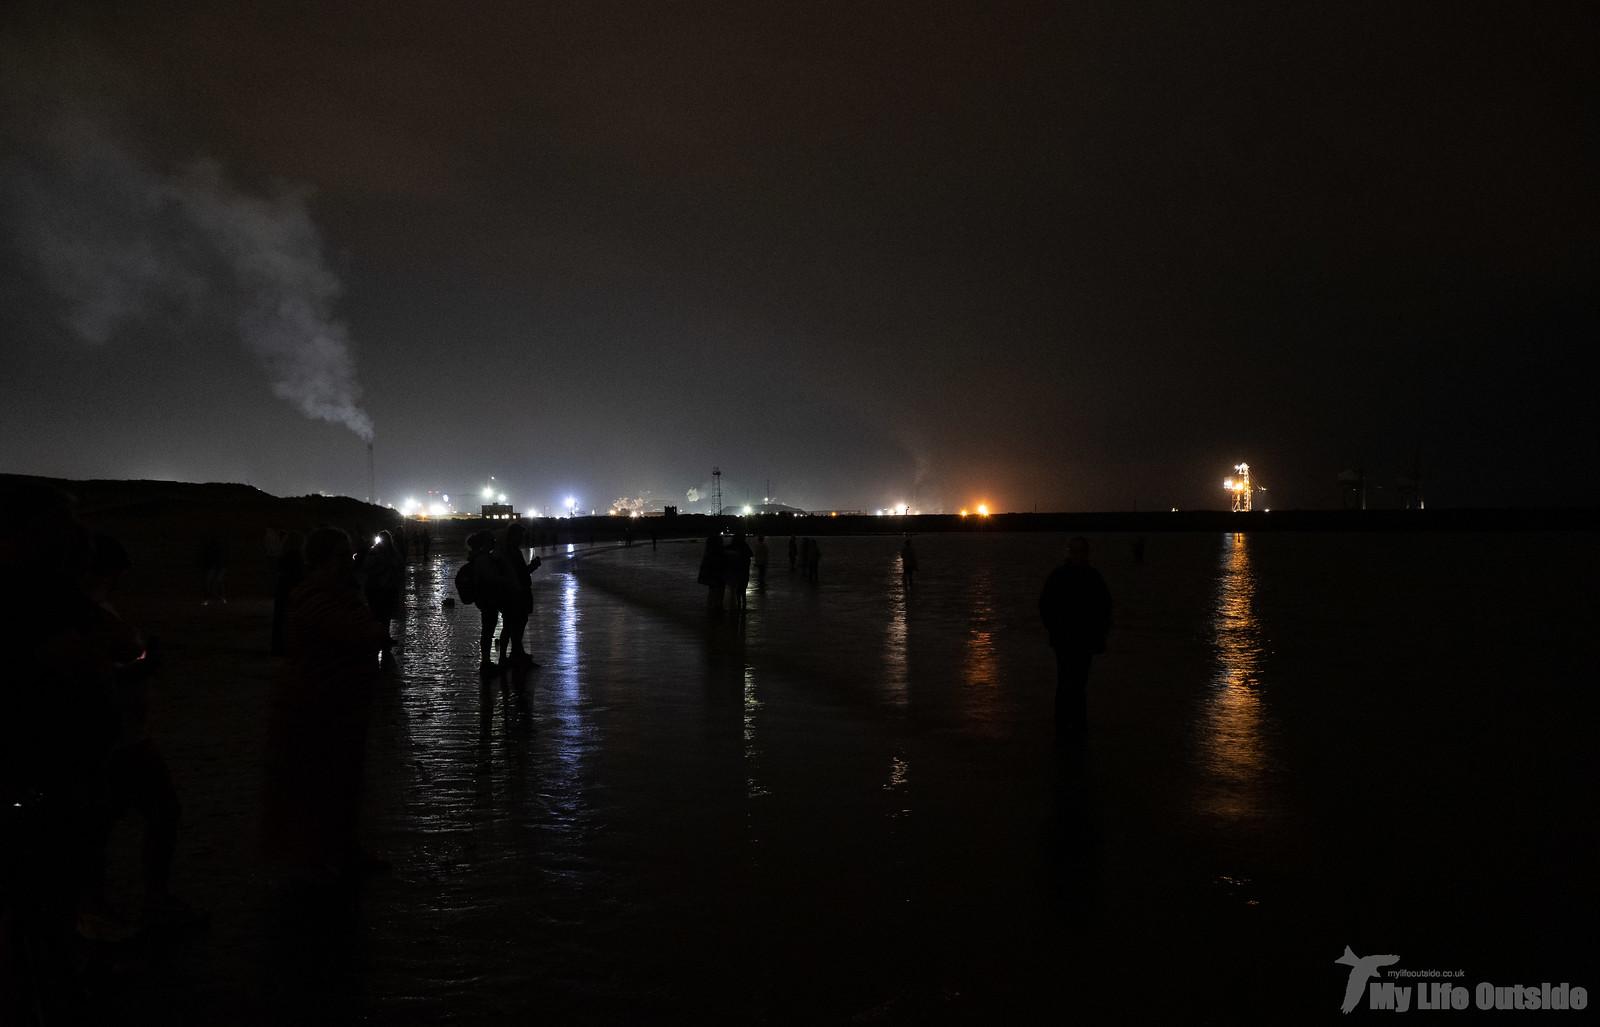 P7013444 - Bioluminescent Plankton, Aberavon